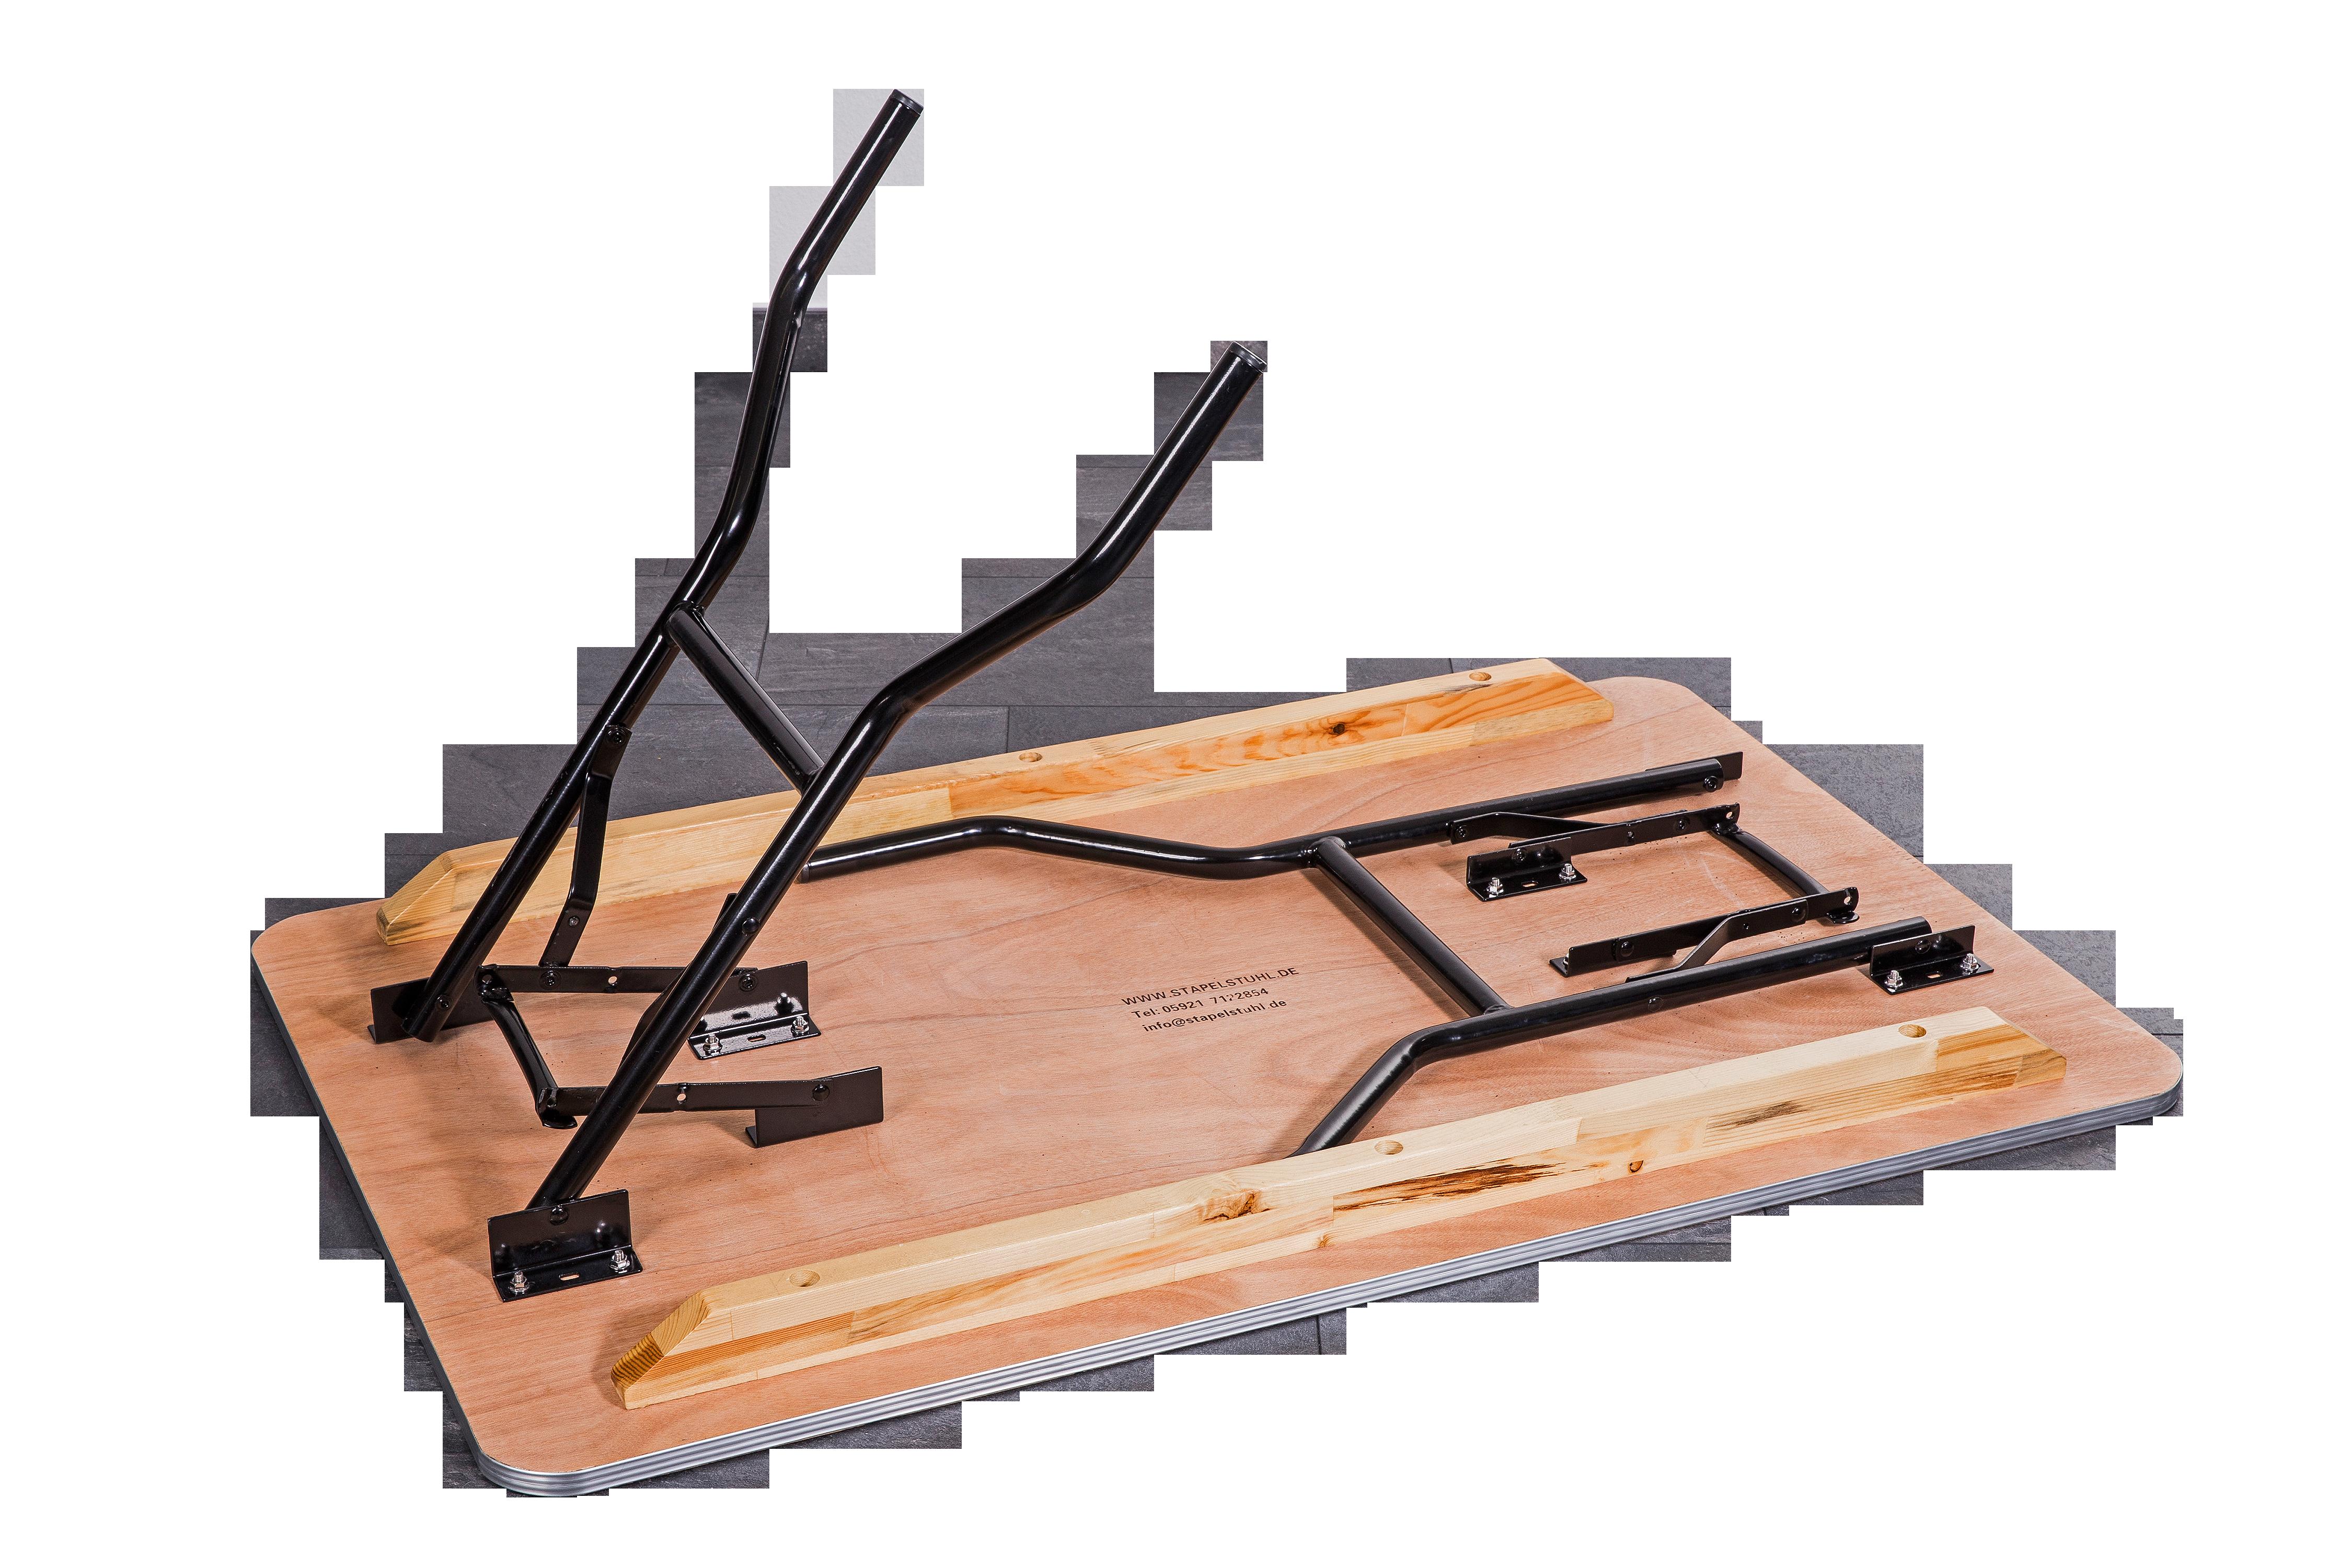 Klapptische / Banketttisch Woody eckig 153x76cm